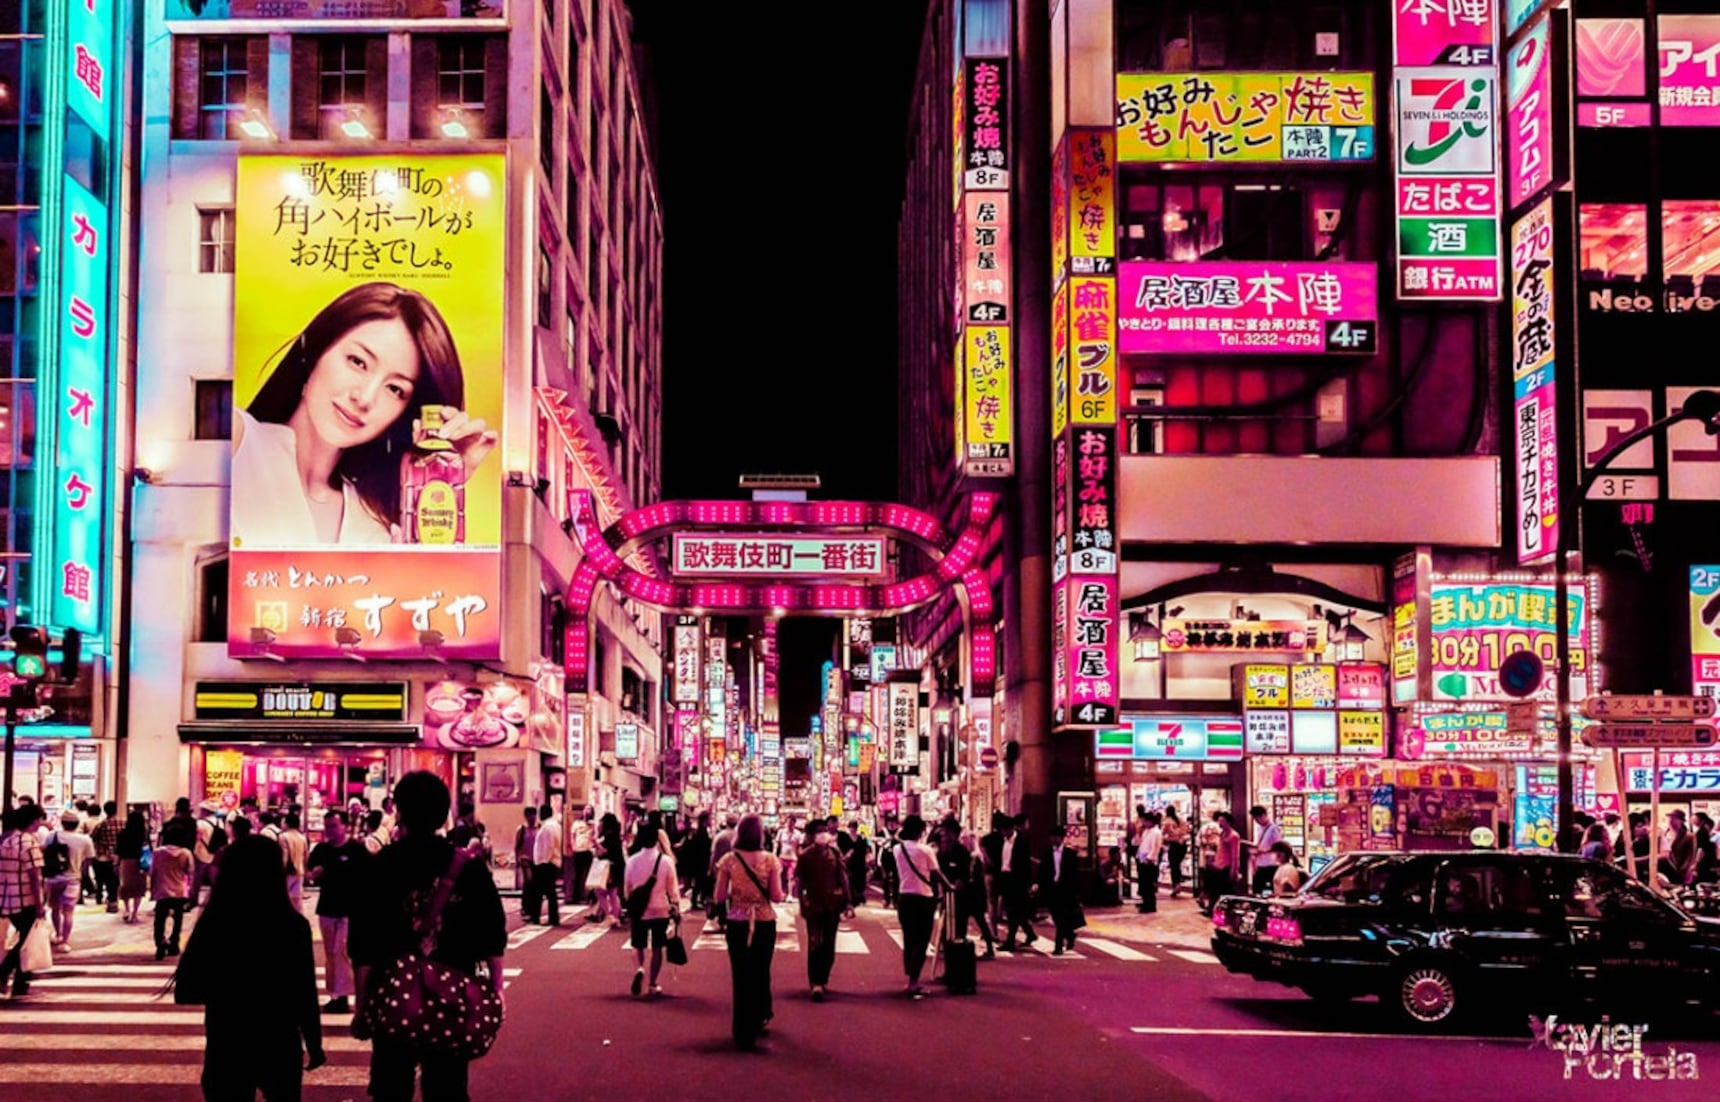 Stunning Photos Capture Tokyo Nightscape